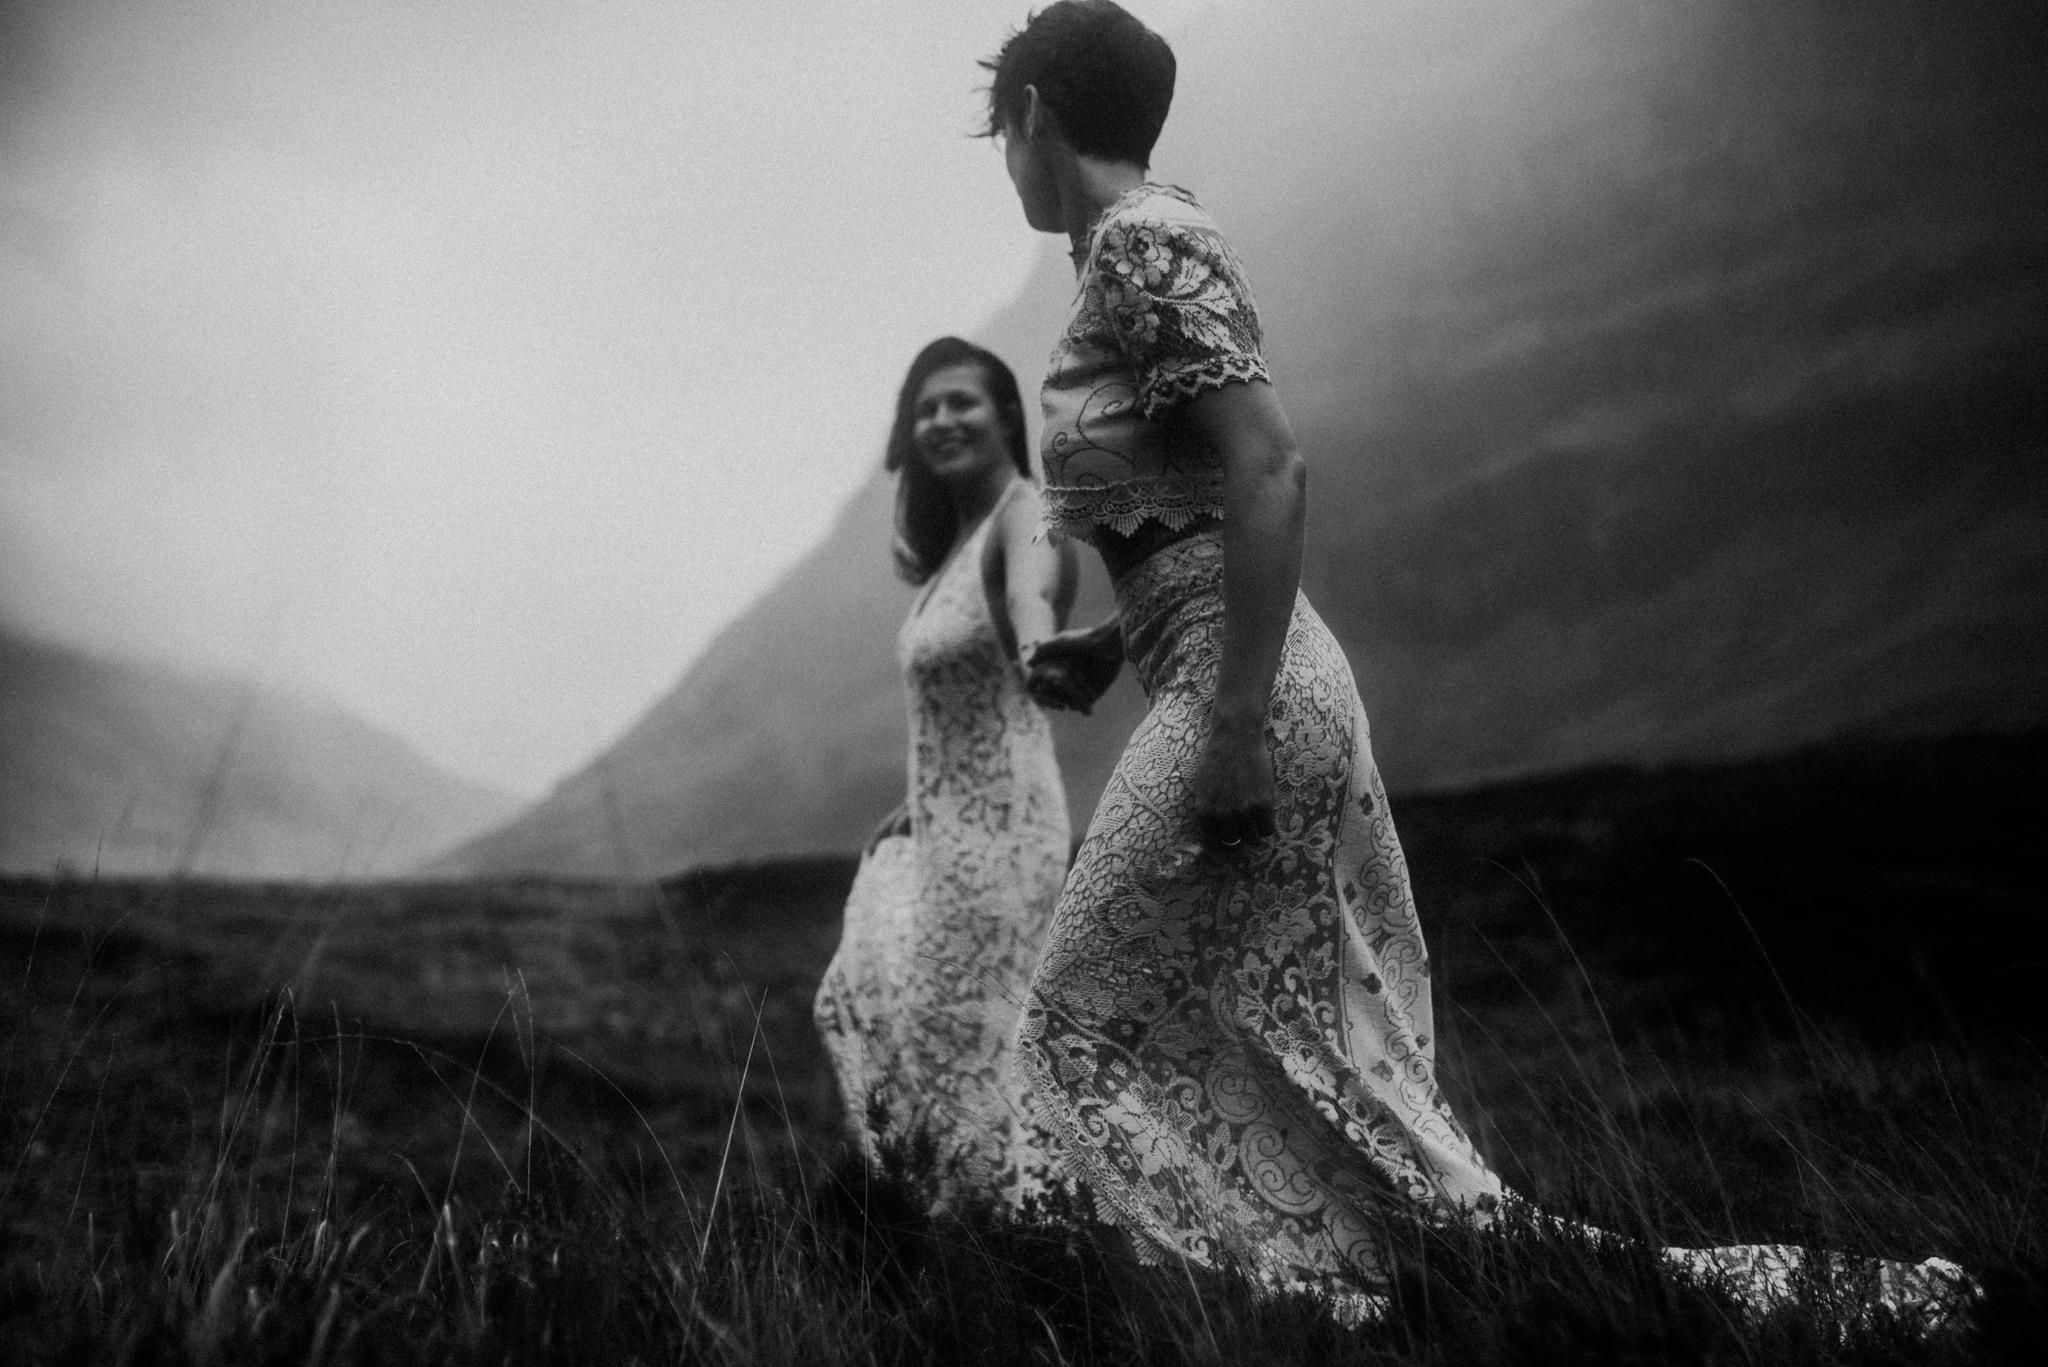 twyla jones photography - scotland glencoe moody same sex elopement brides -25.jpg